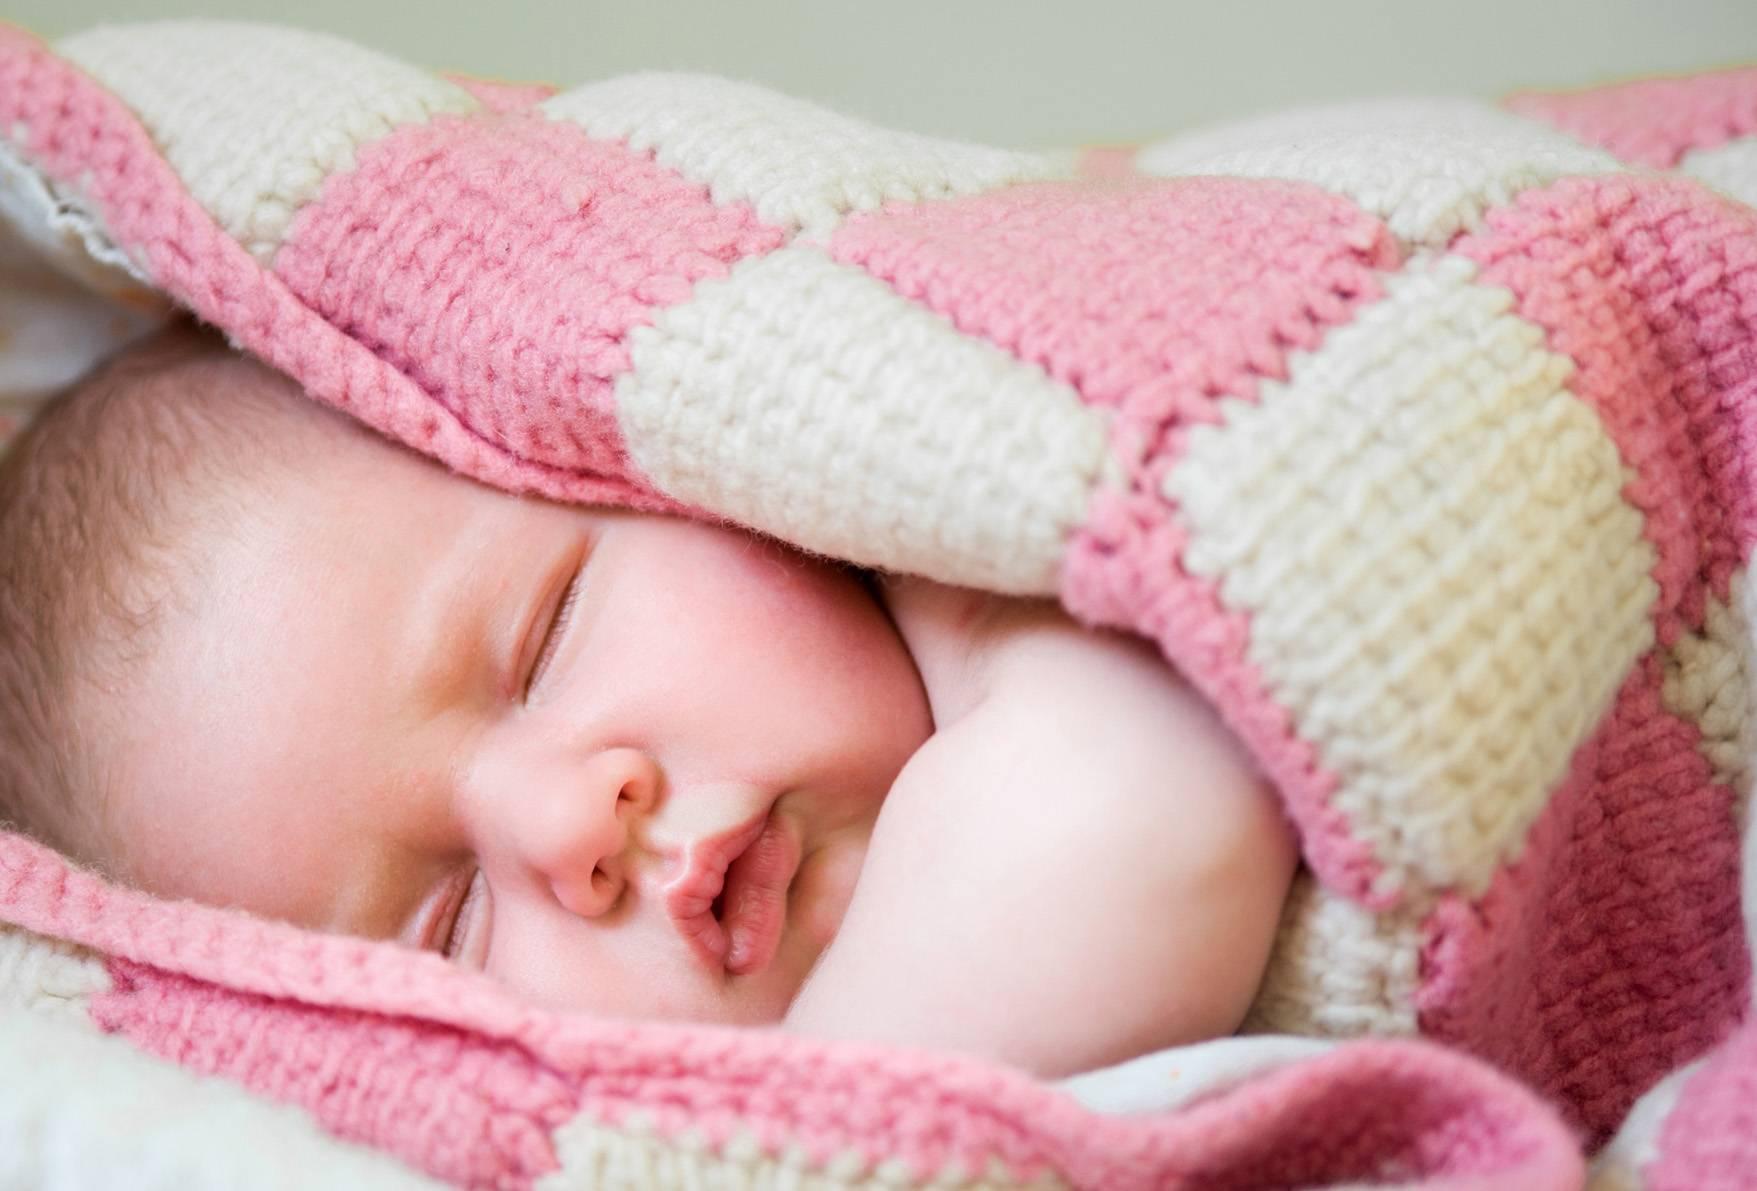 Почему ребенок 5 лет сильно потеет во сне